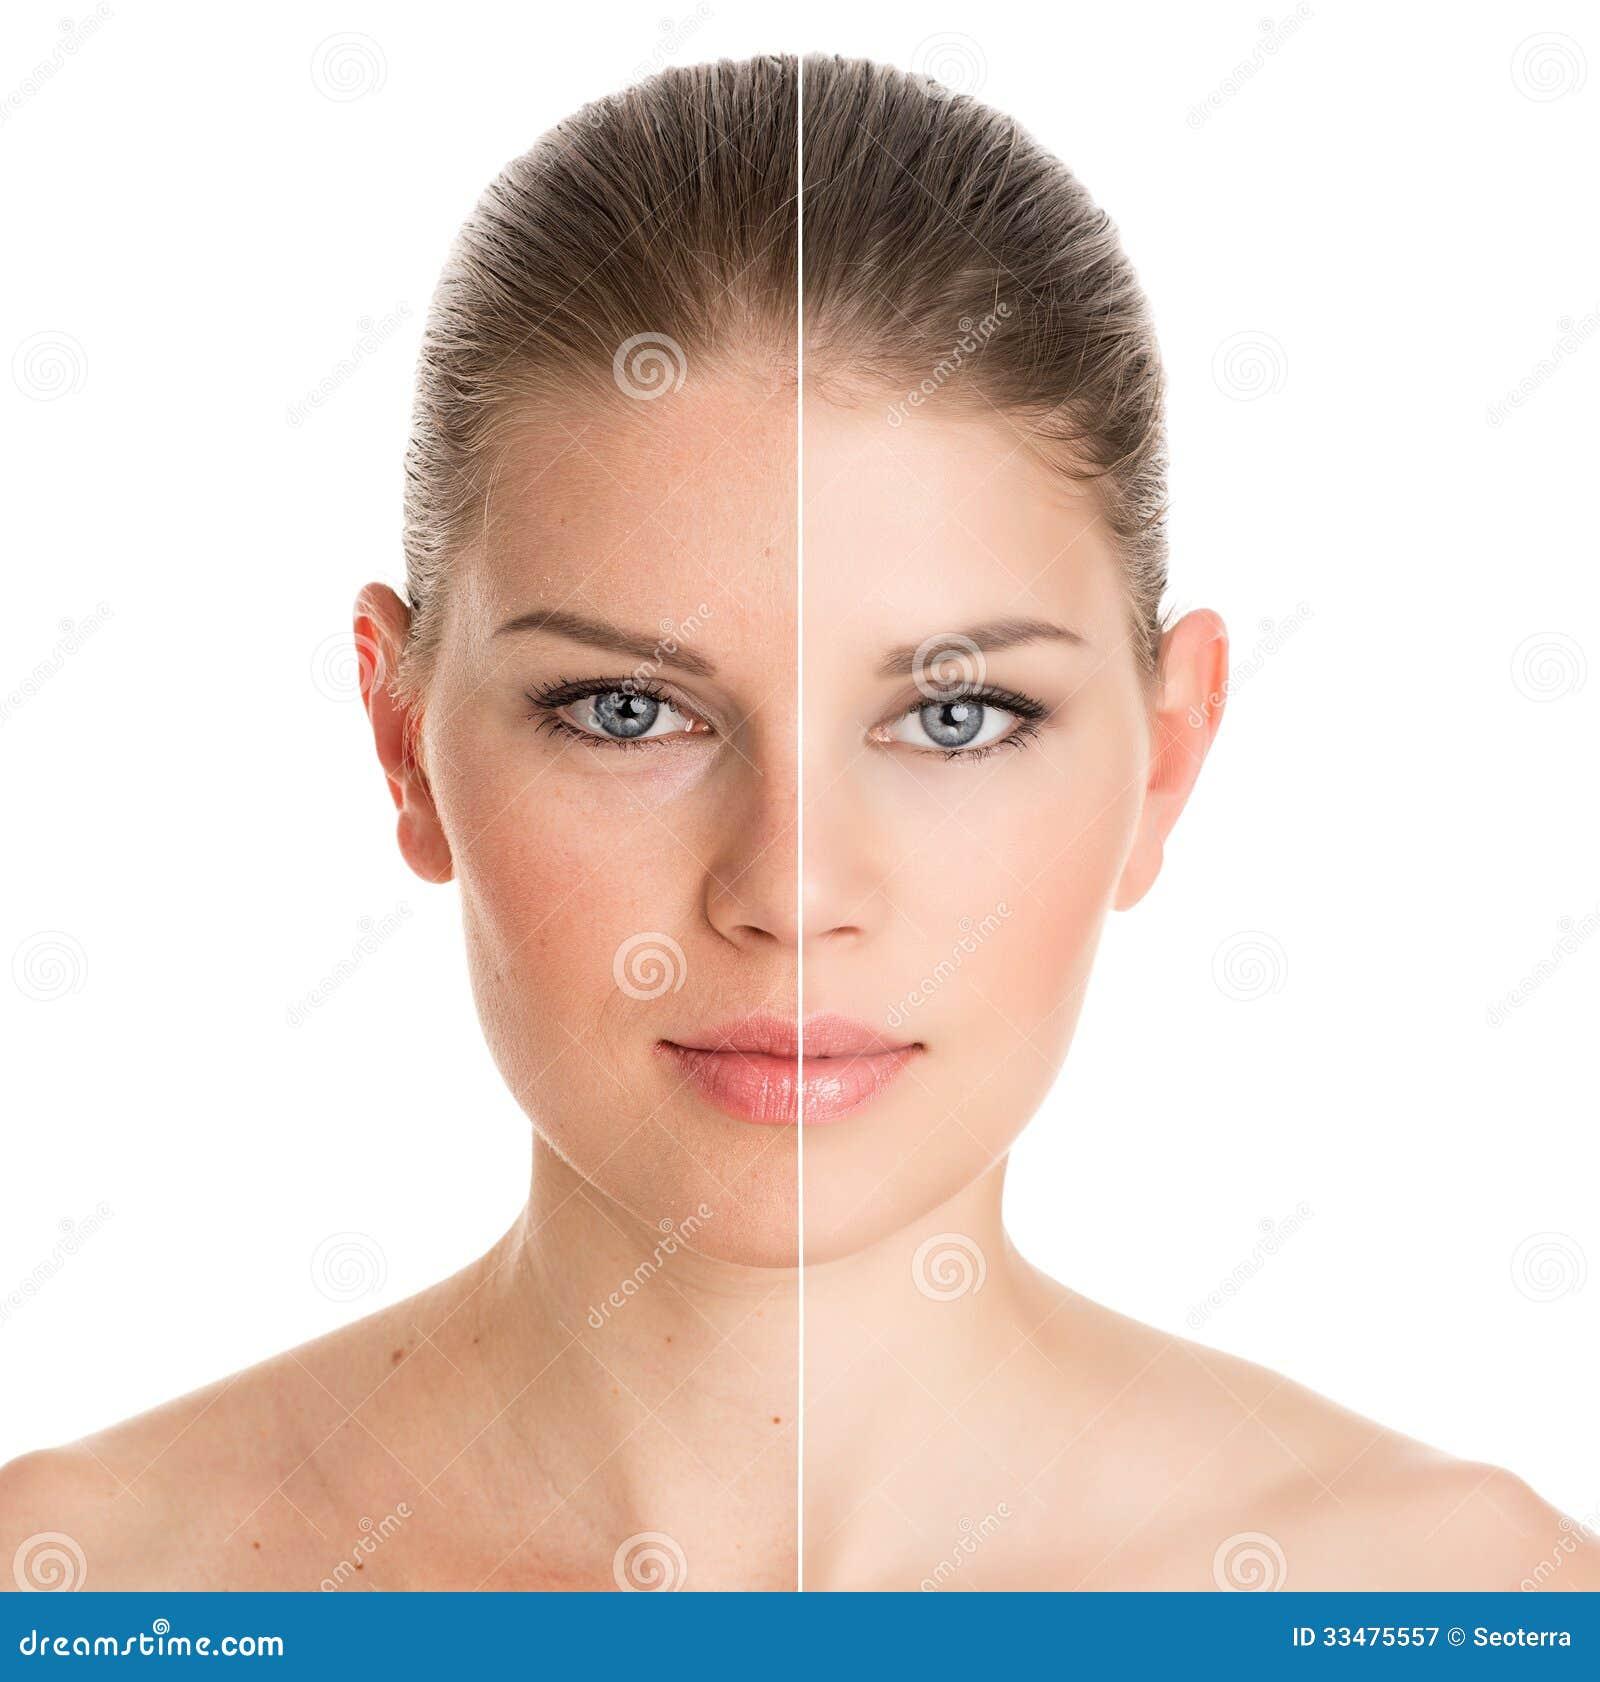 Before and after kosmetische verrichting